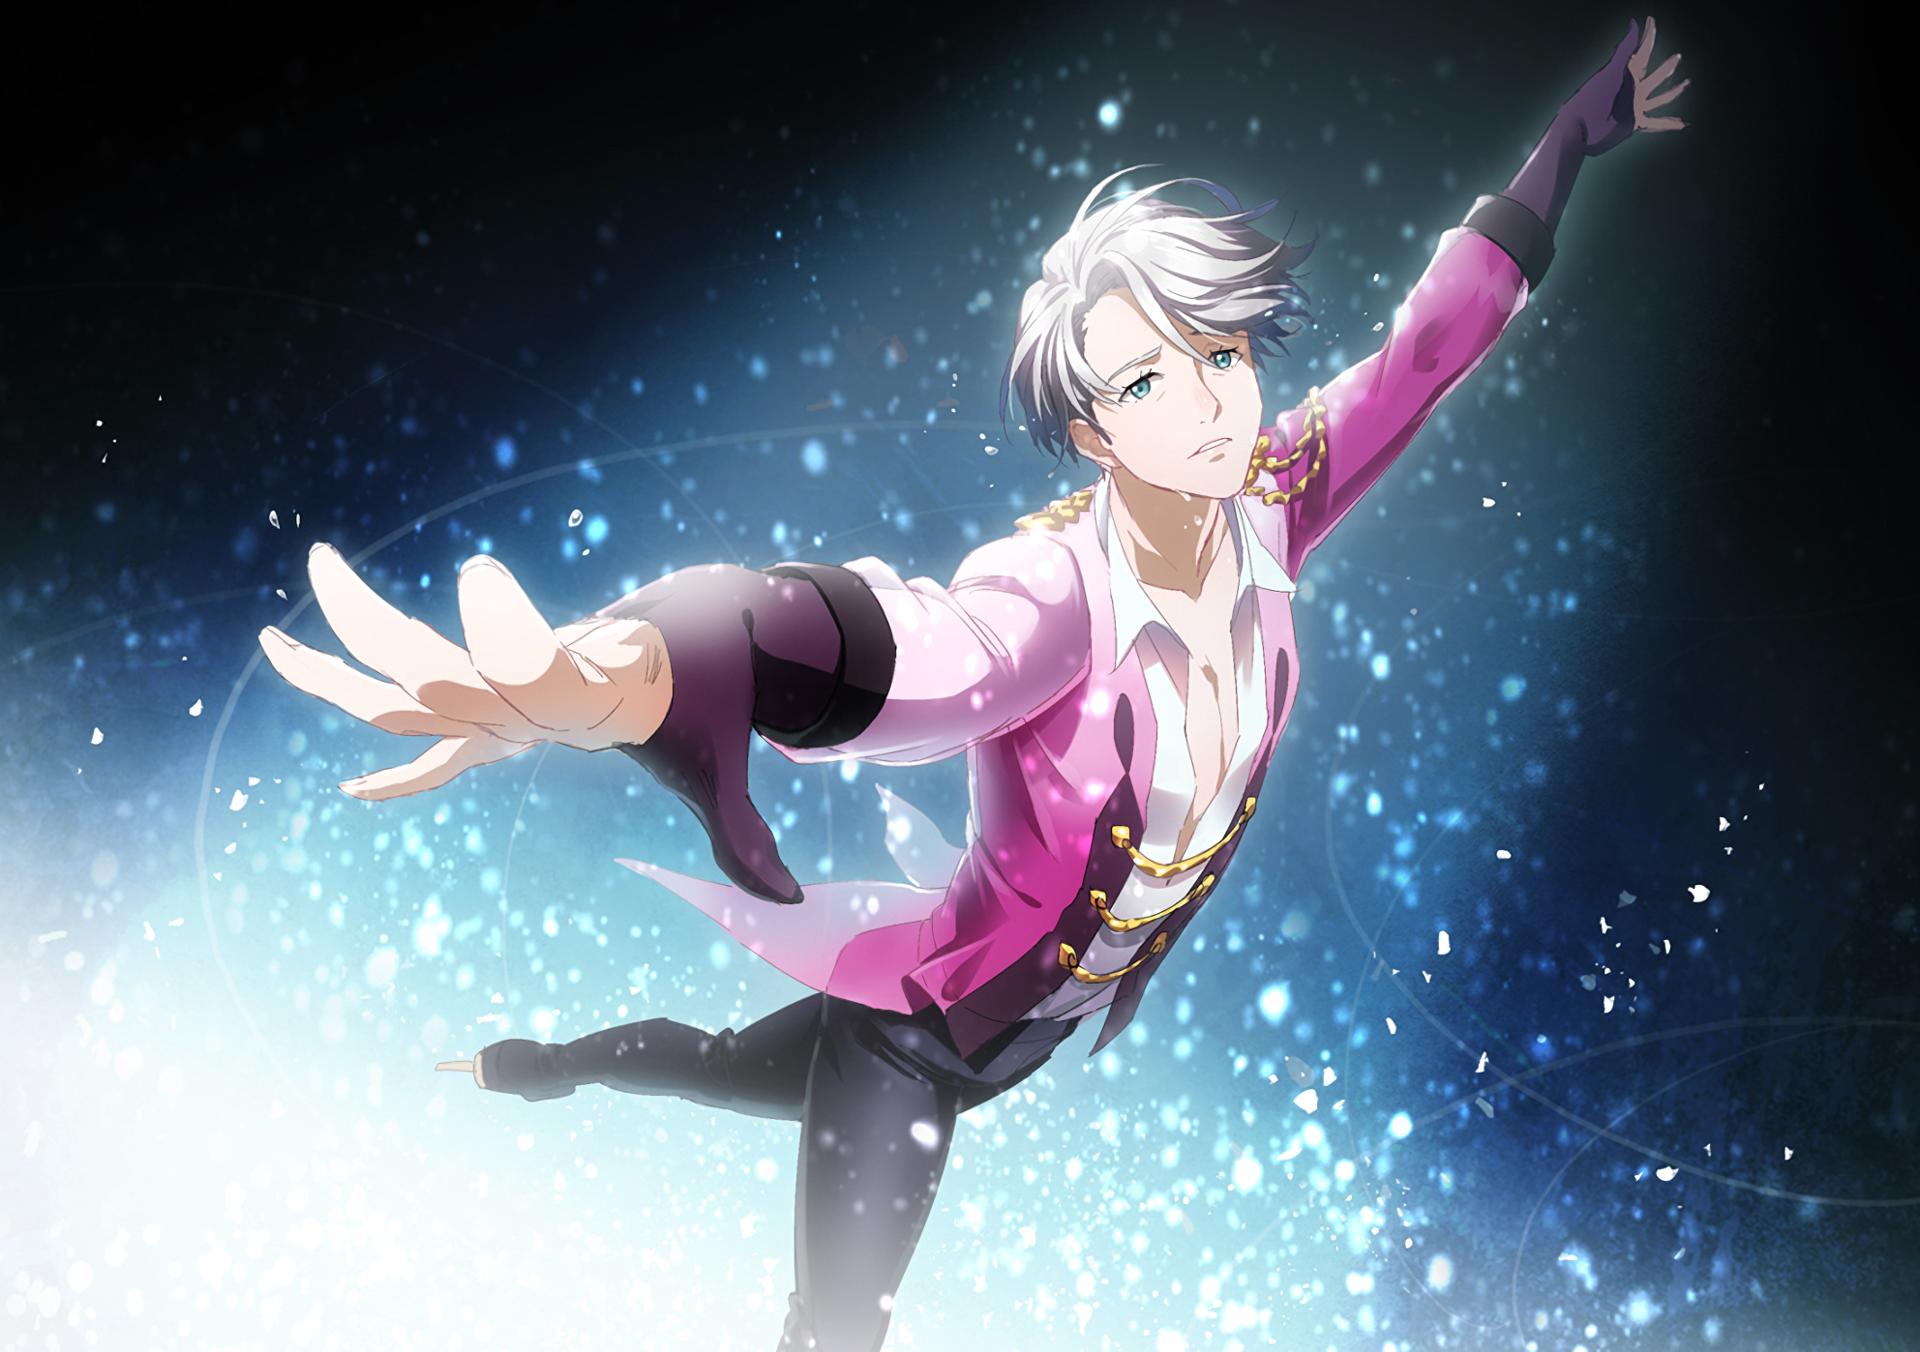 Anime Yuri On Ice Victor Nikiforov Wallpaper การออกแบบต วละคร